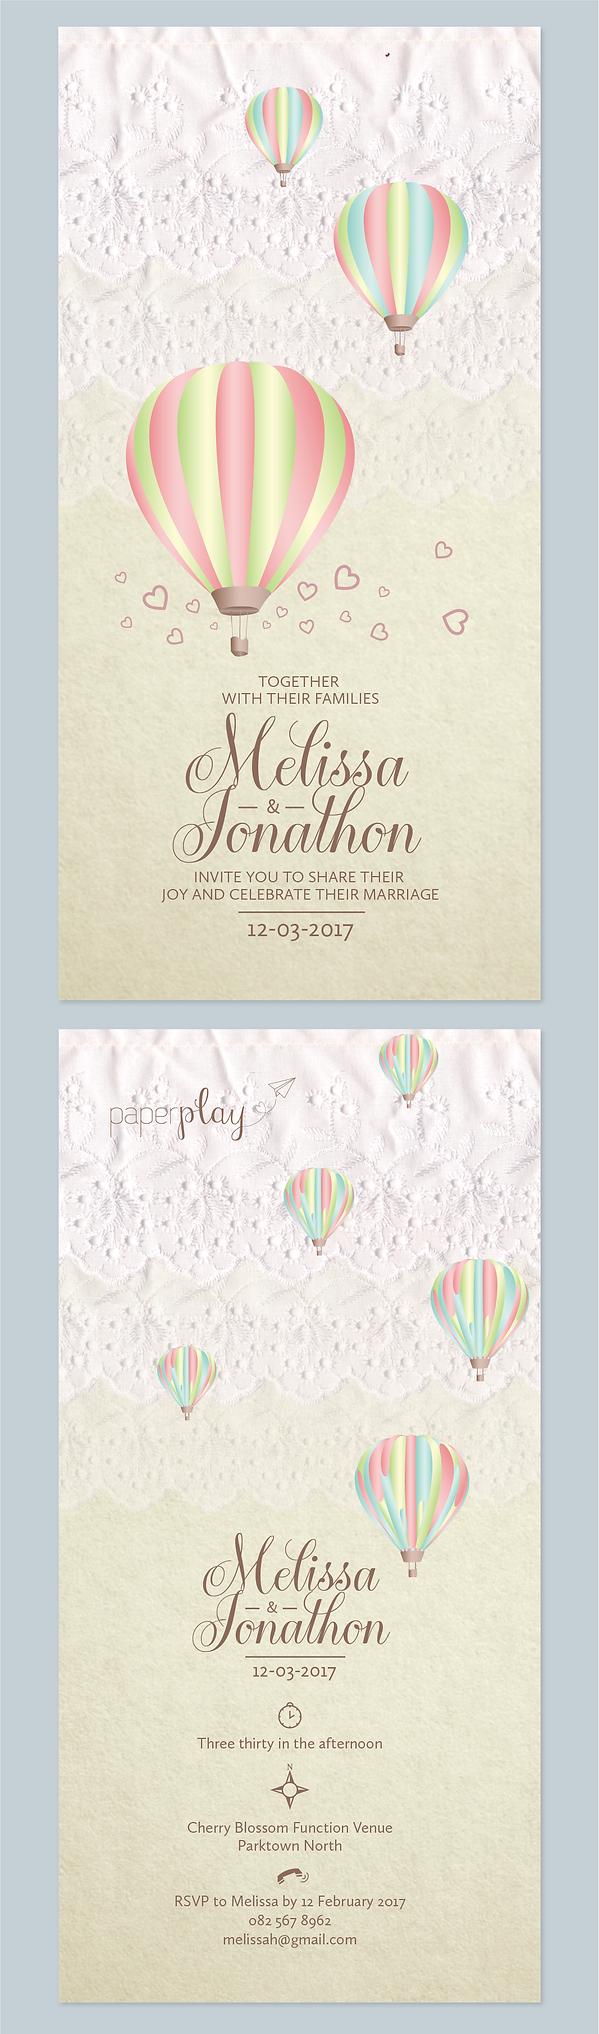 Studio Marguerite | Wedding Invitation Collection